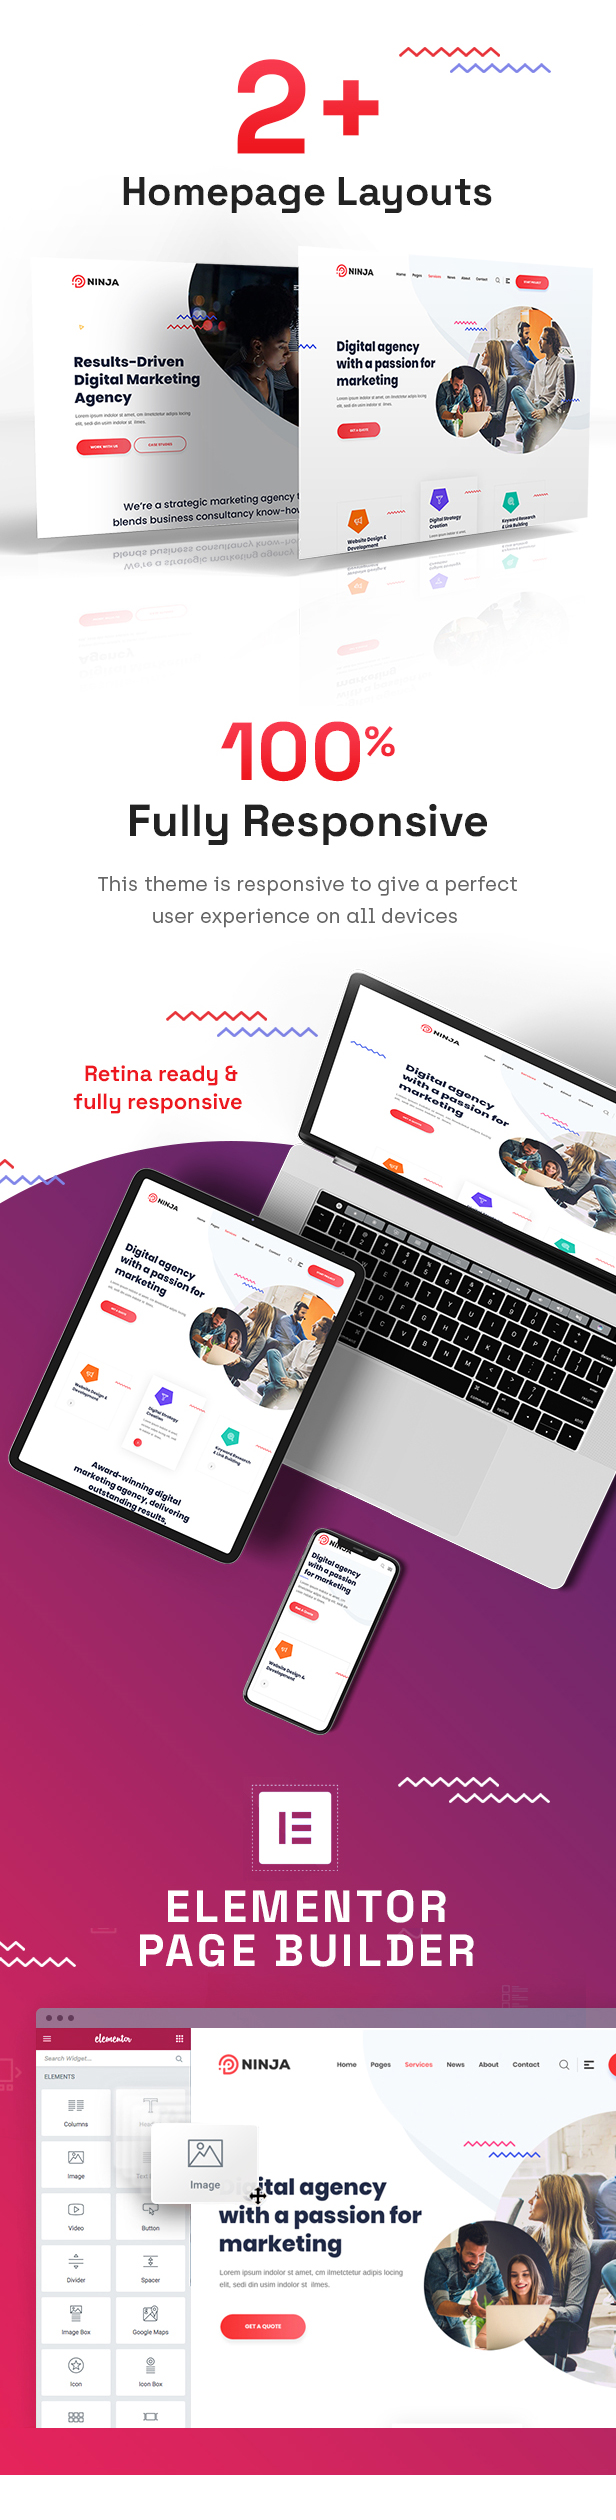 Ninja - SEO & Digital Marketing WordPress Theme - 2